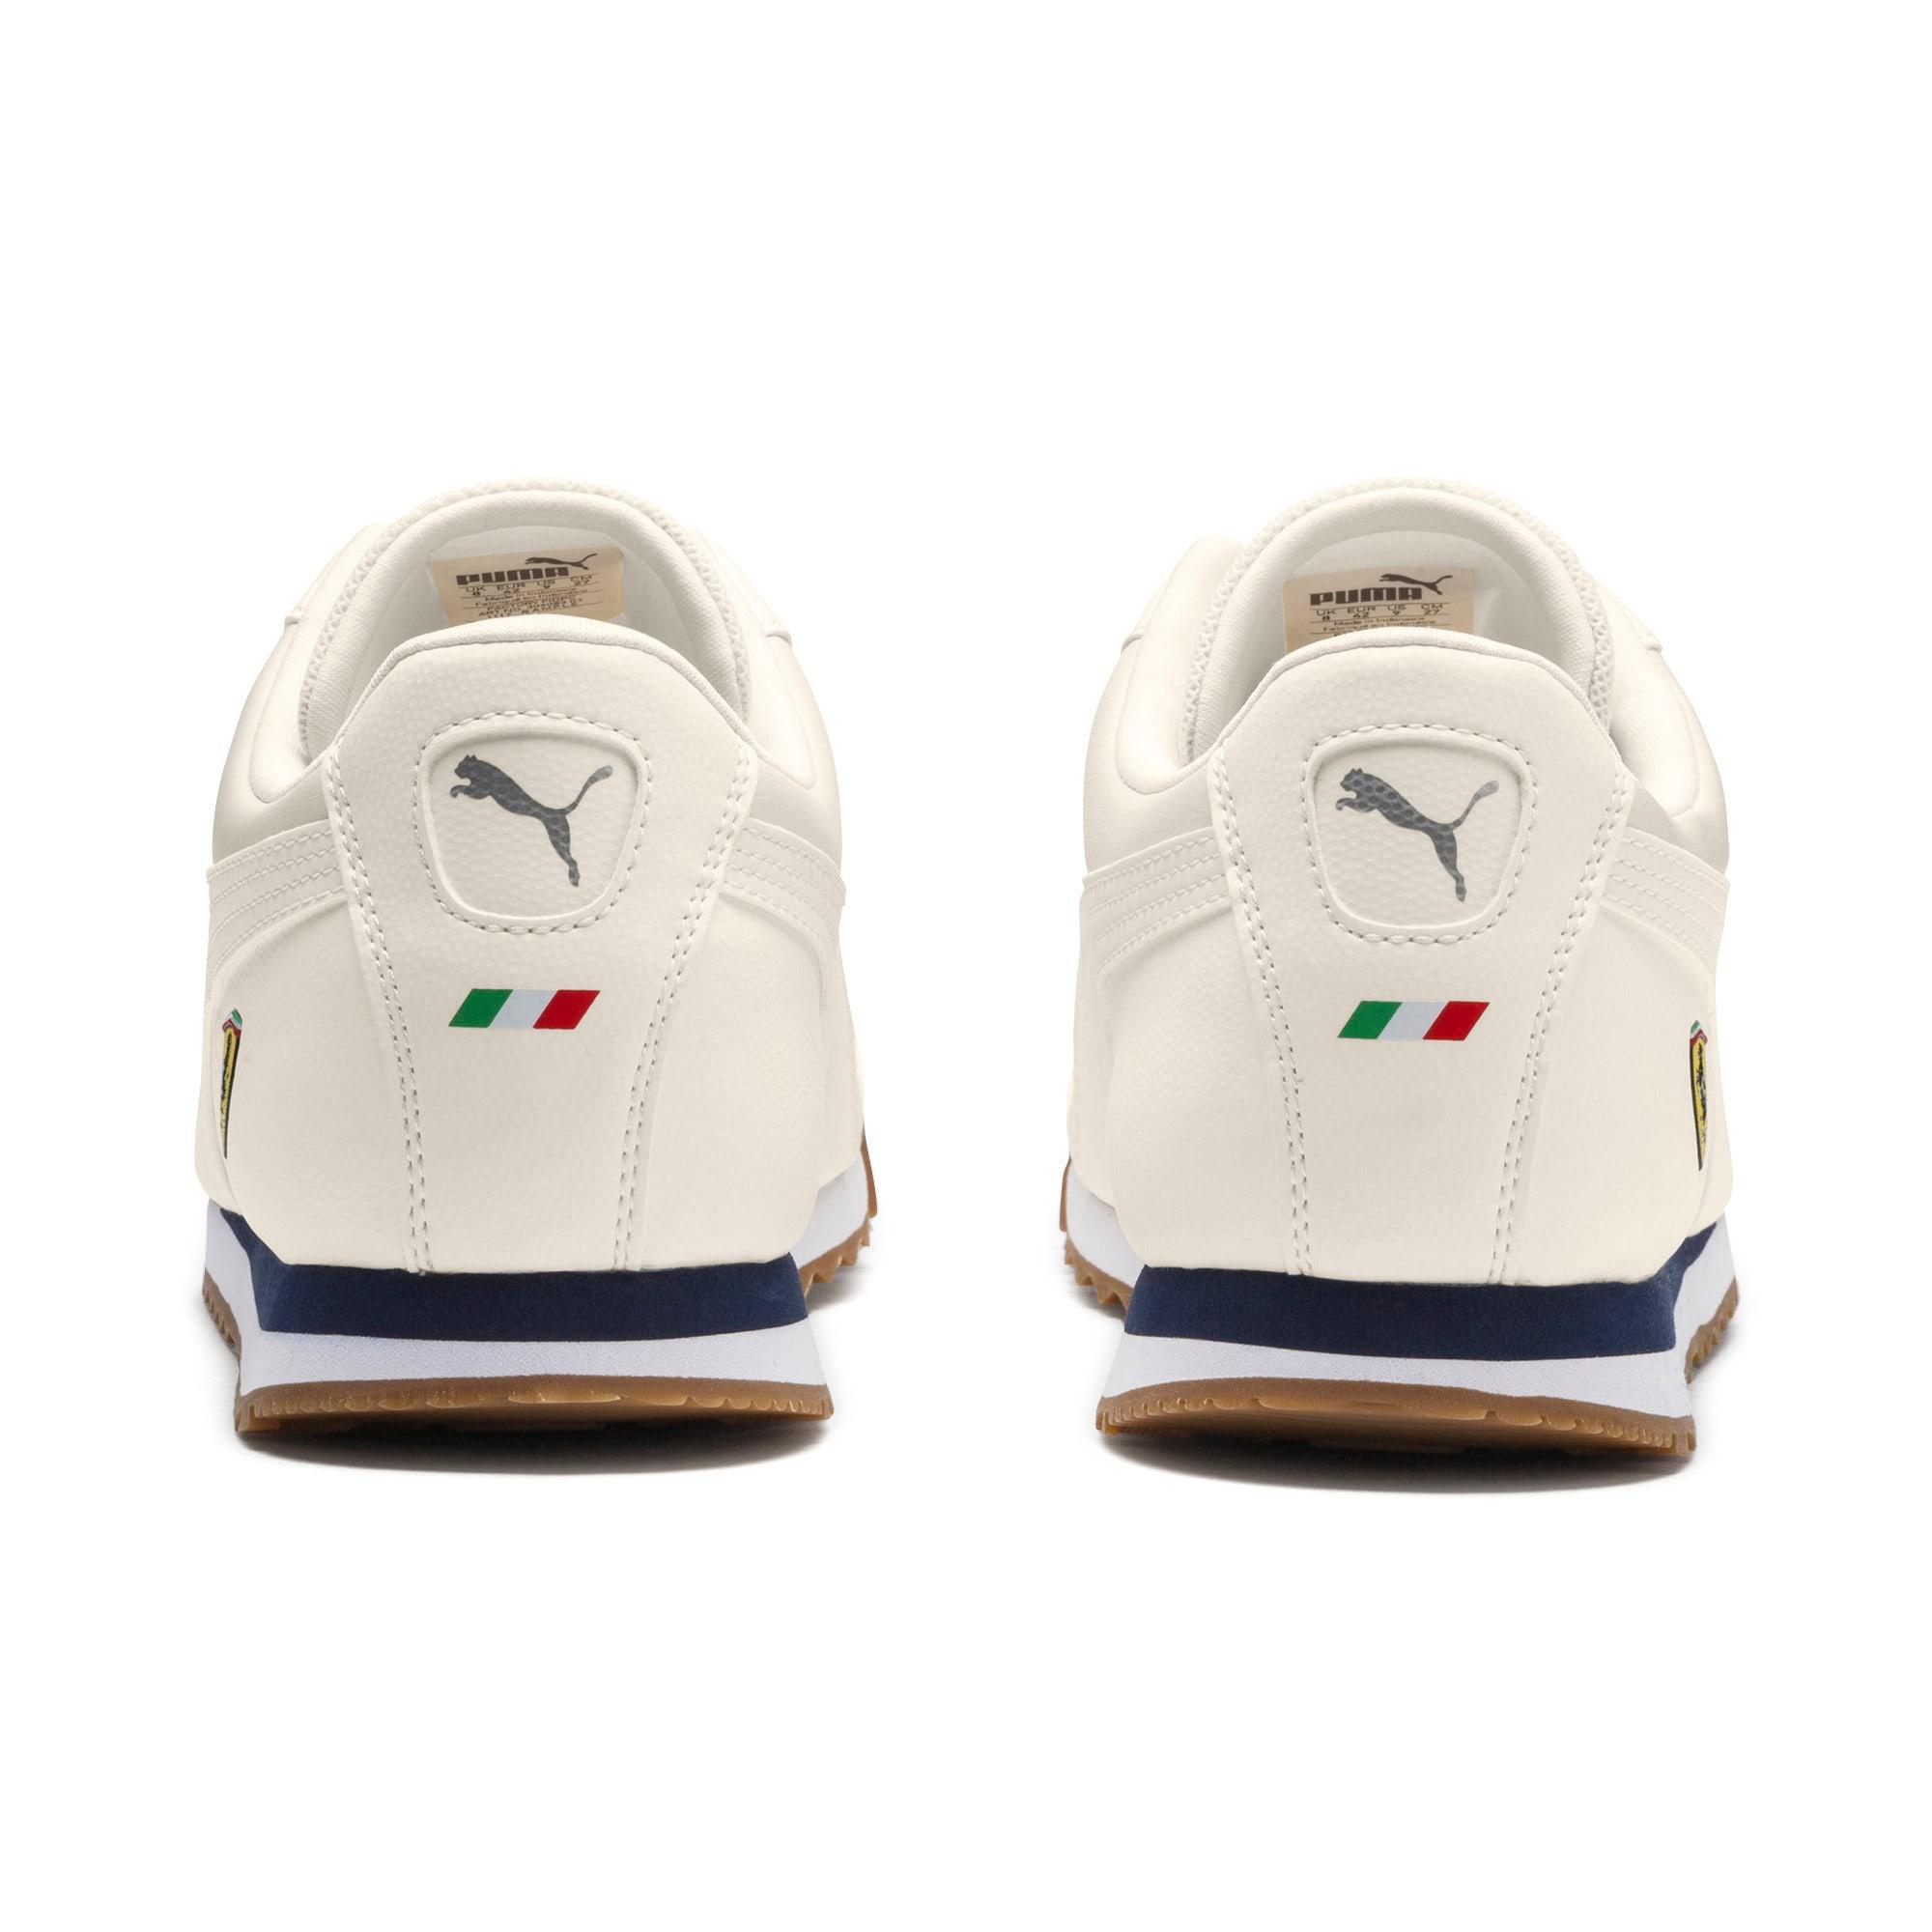 Thumbnail 4 of Scuderia Ferrari Roma Men's Sneakers, Whisper White-Whisper White, medium